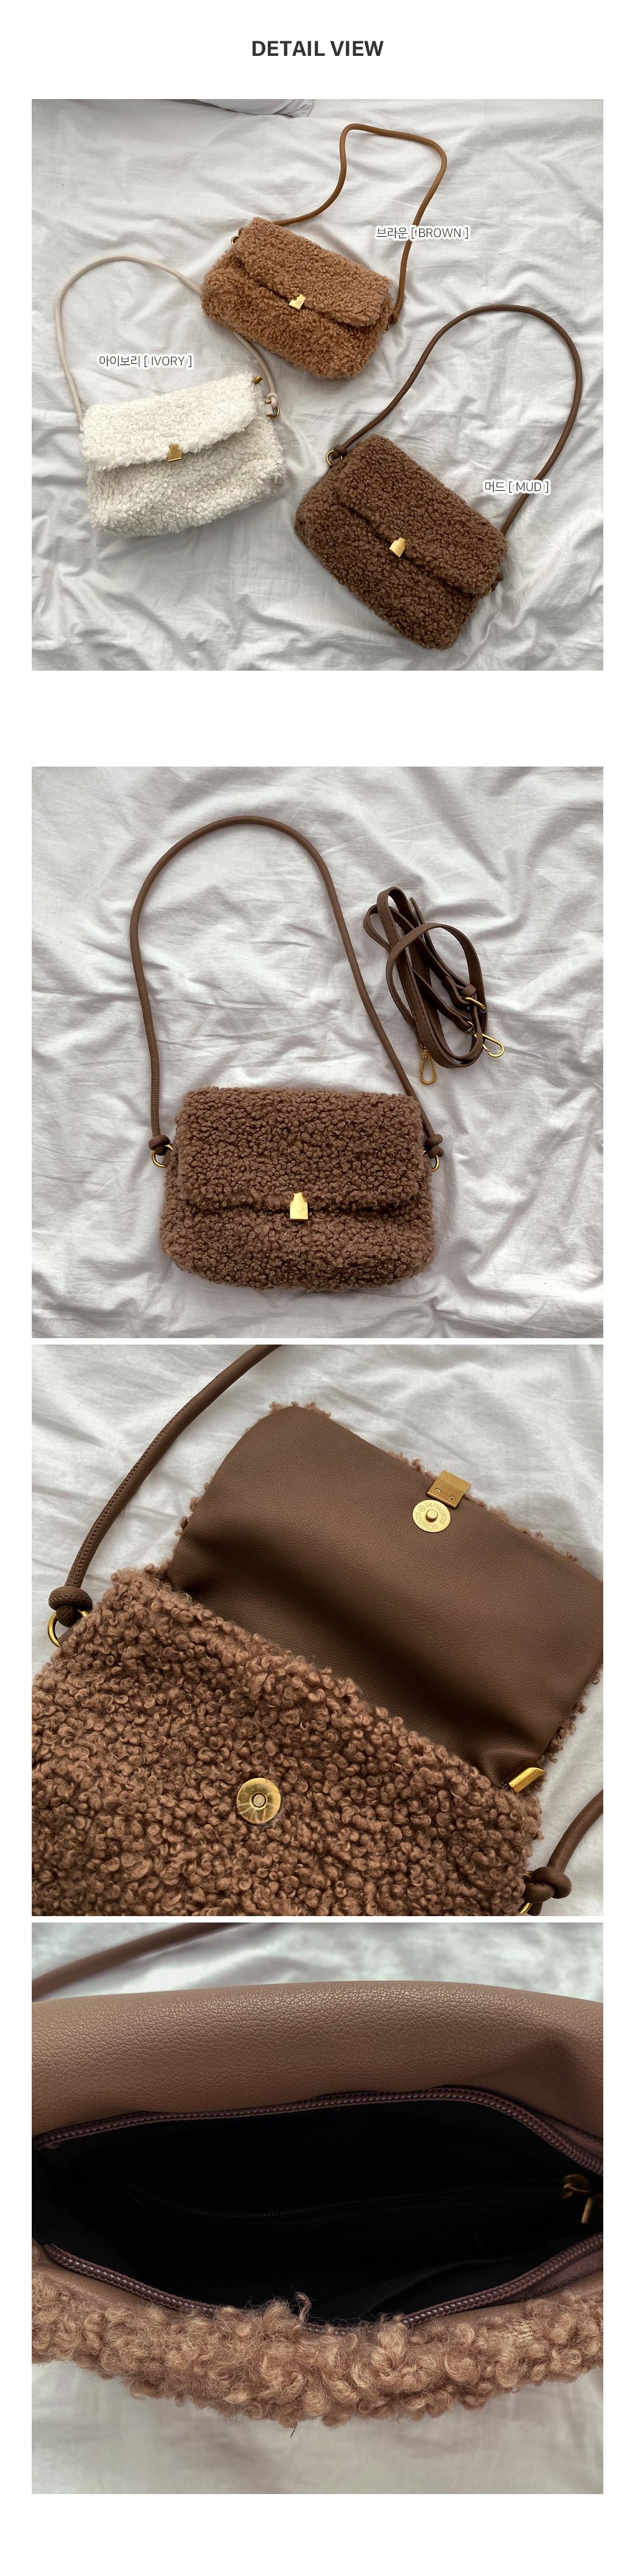 Poglyi Square Bag-3color